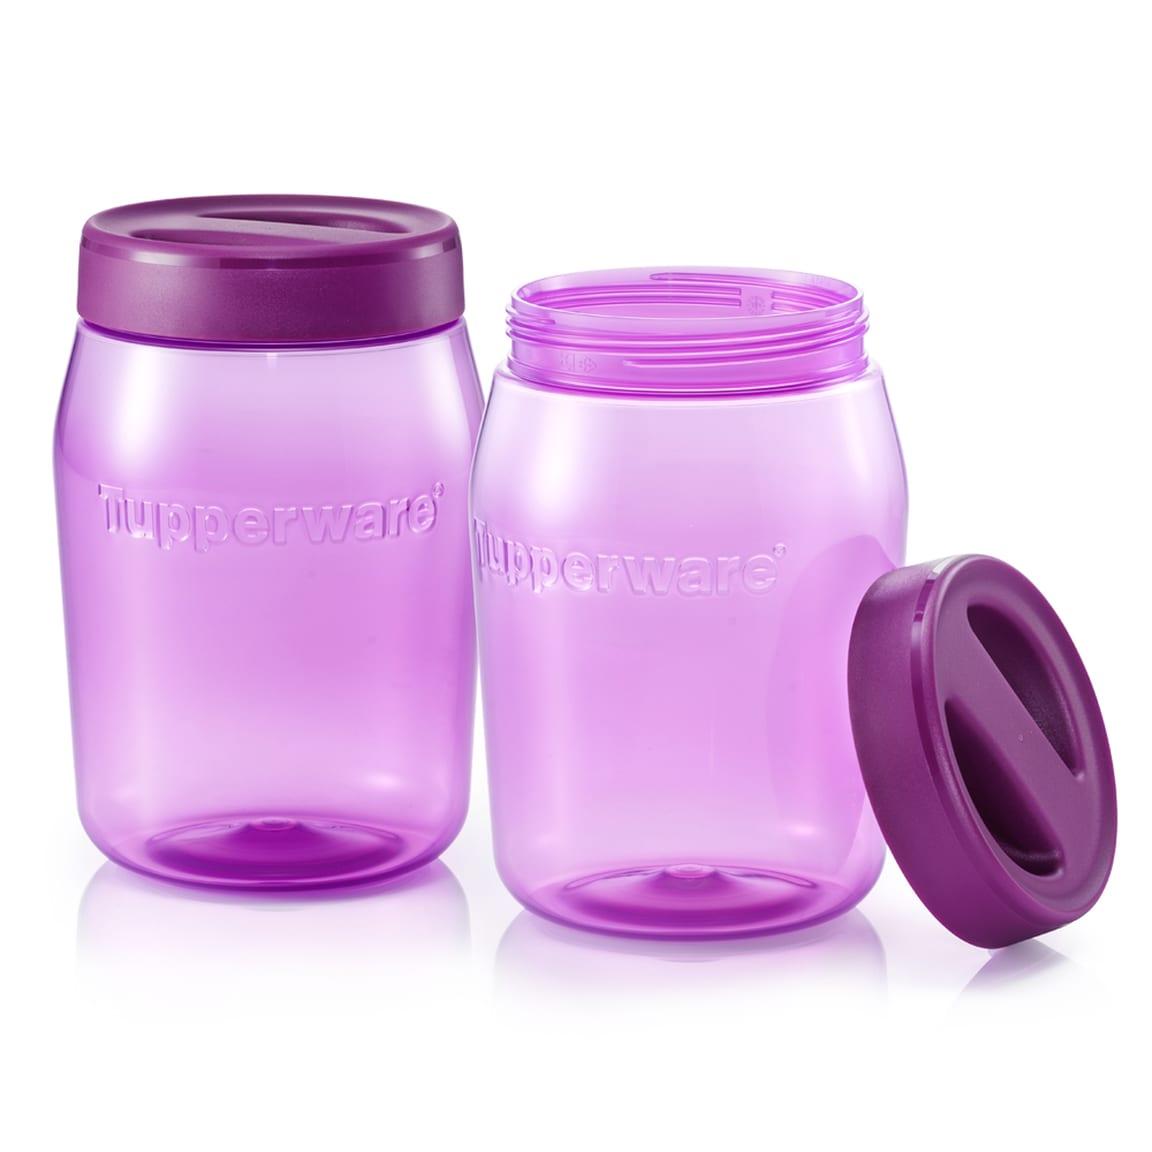 Universal Jar (2) 1.5L with Flat seal